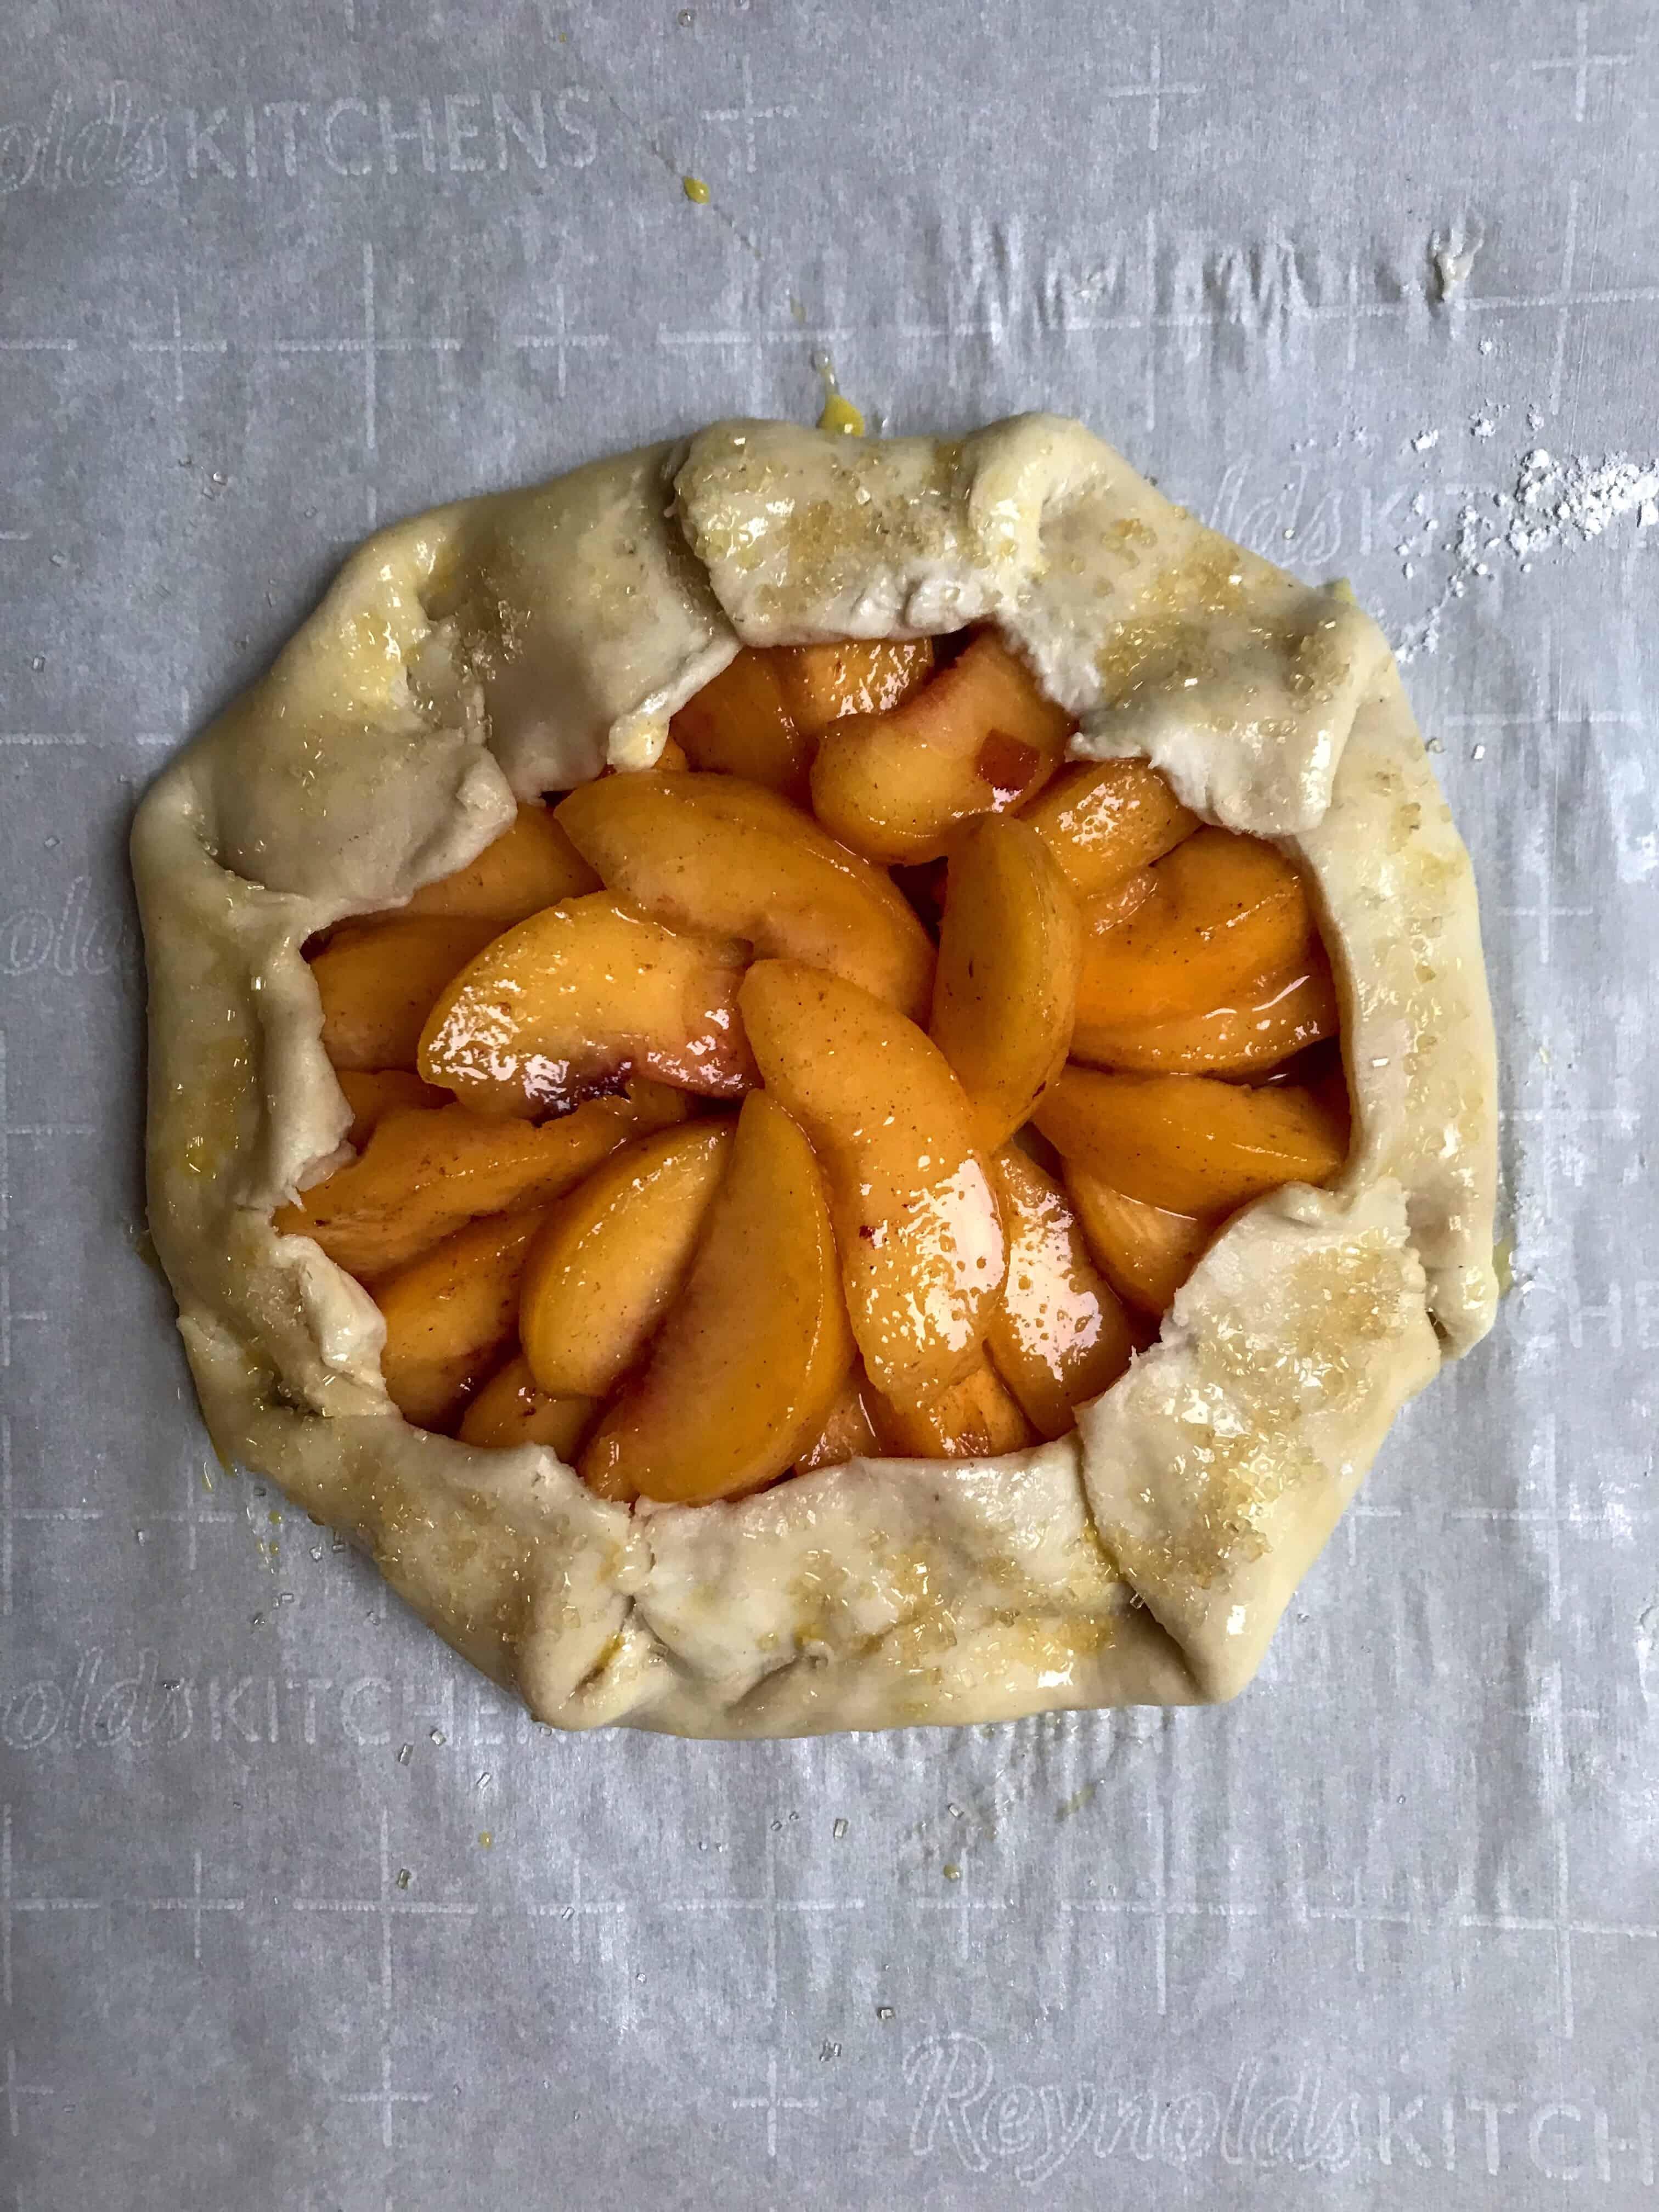 pre-baked peach galette